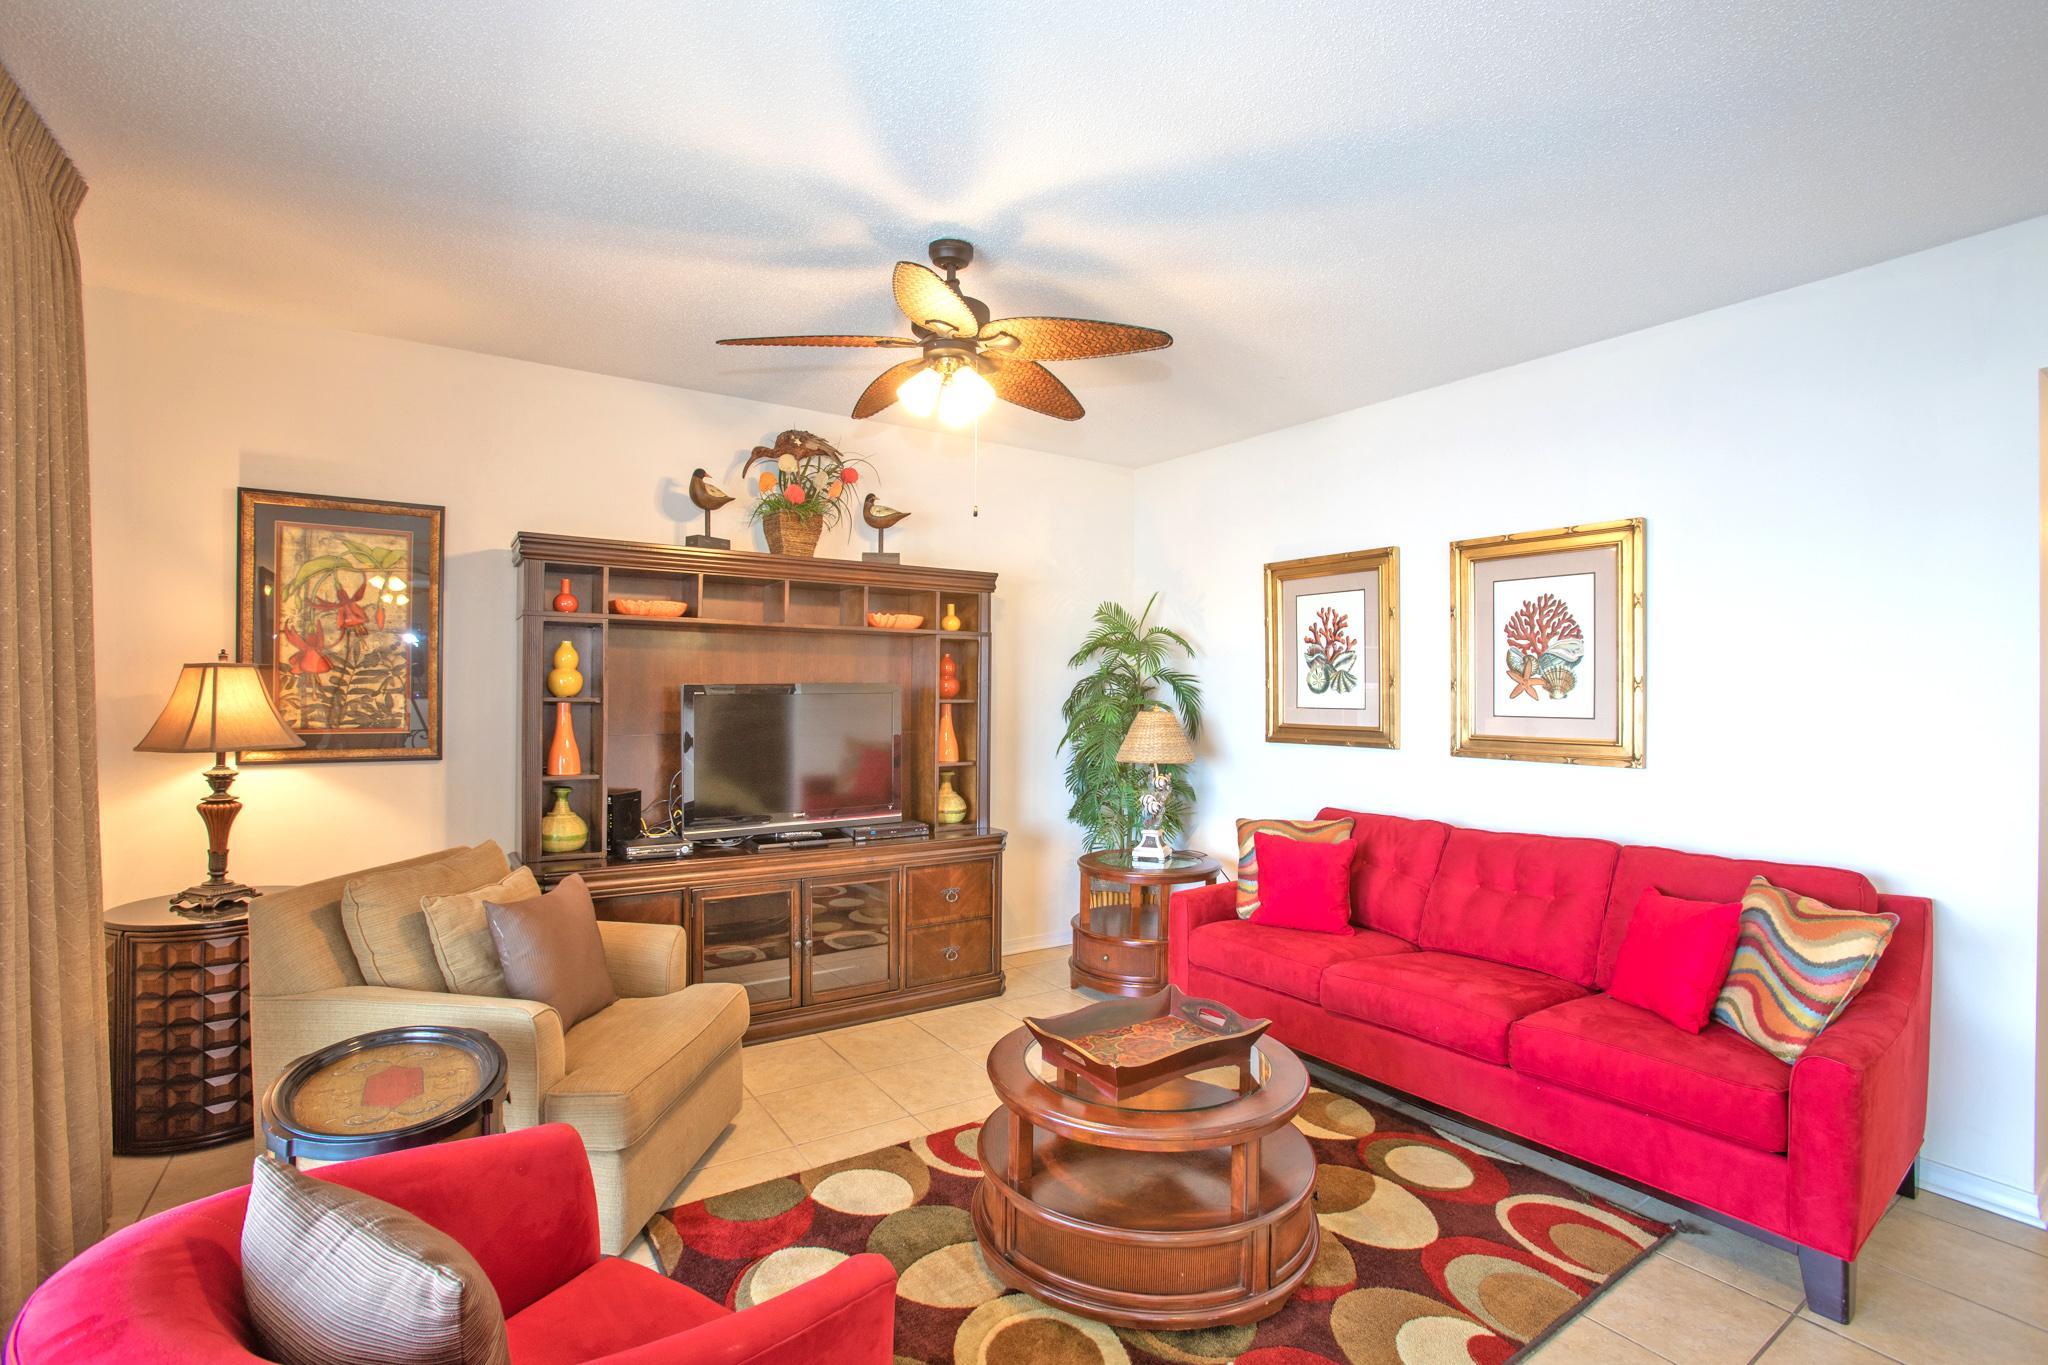 South Harbour #7E Condo rental in South Harbour ~ Pensacola Beach Vacation Rentals by BeachGuide in Pensacola Beach Florida - #16